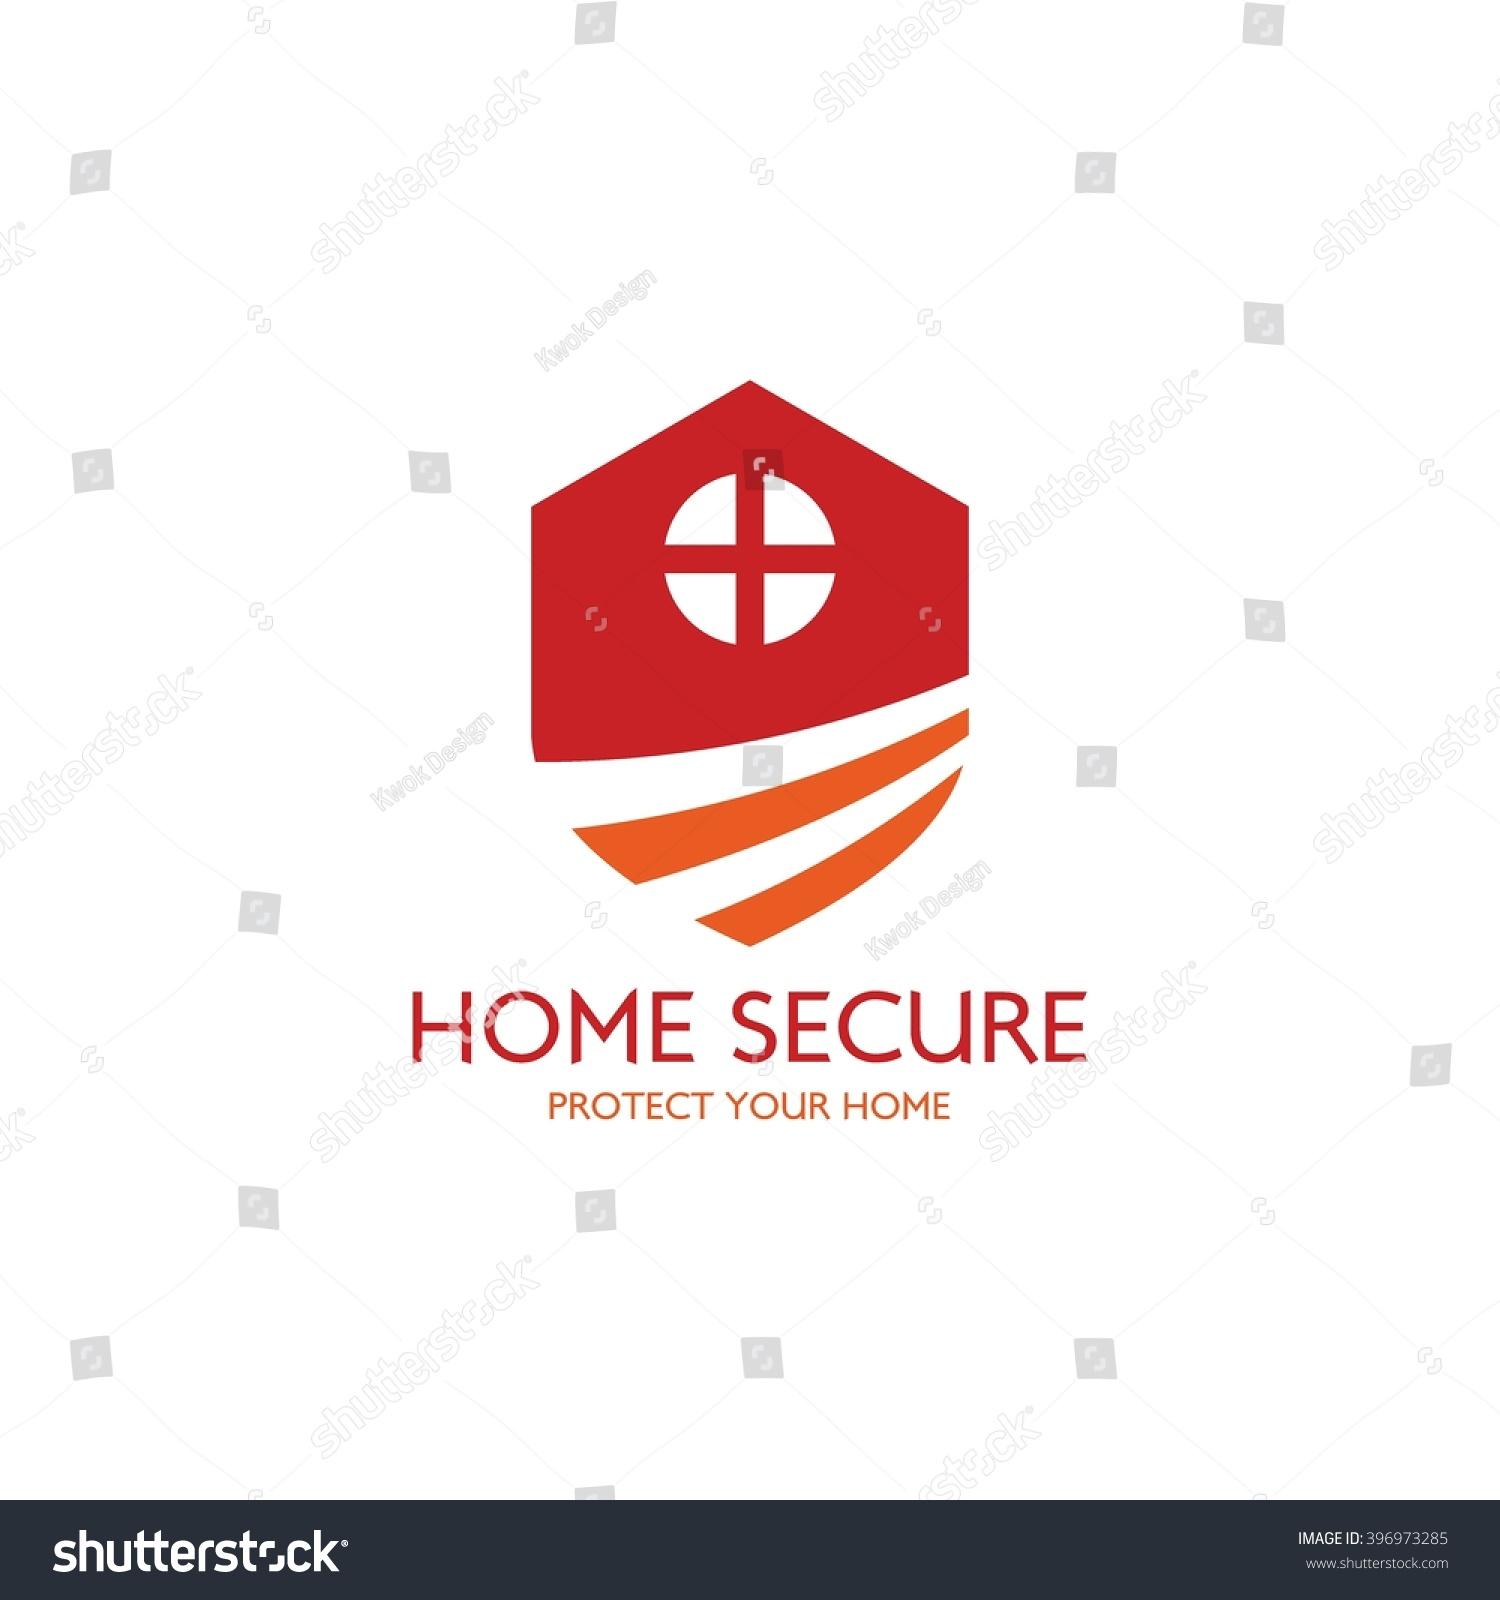 classy chair logo design. Home security logo design template  Guard your house Vector Illustration Security Logo Design Template Stock 396973285